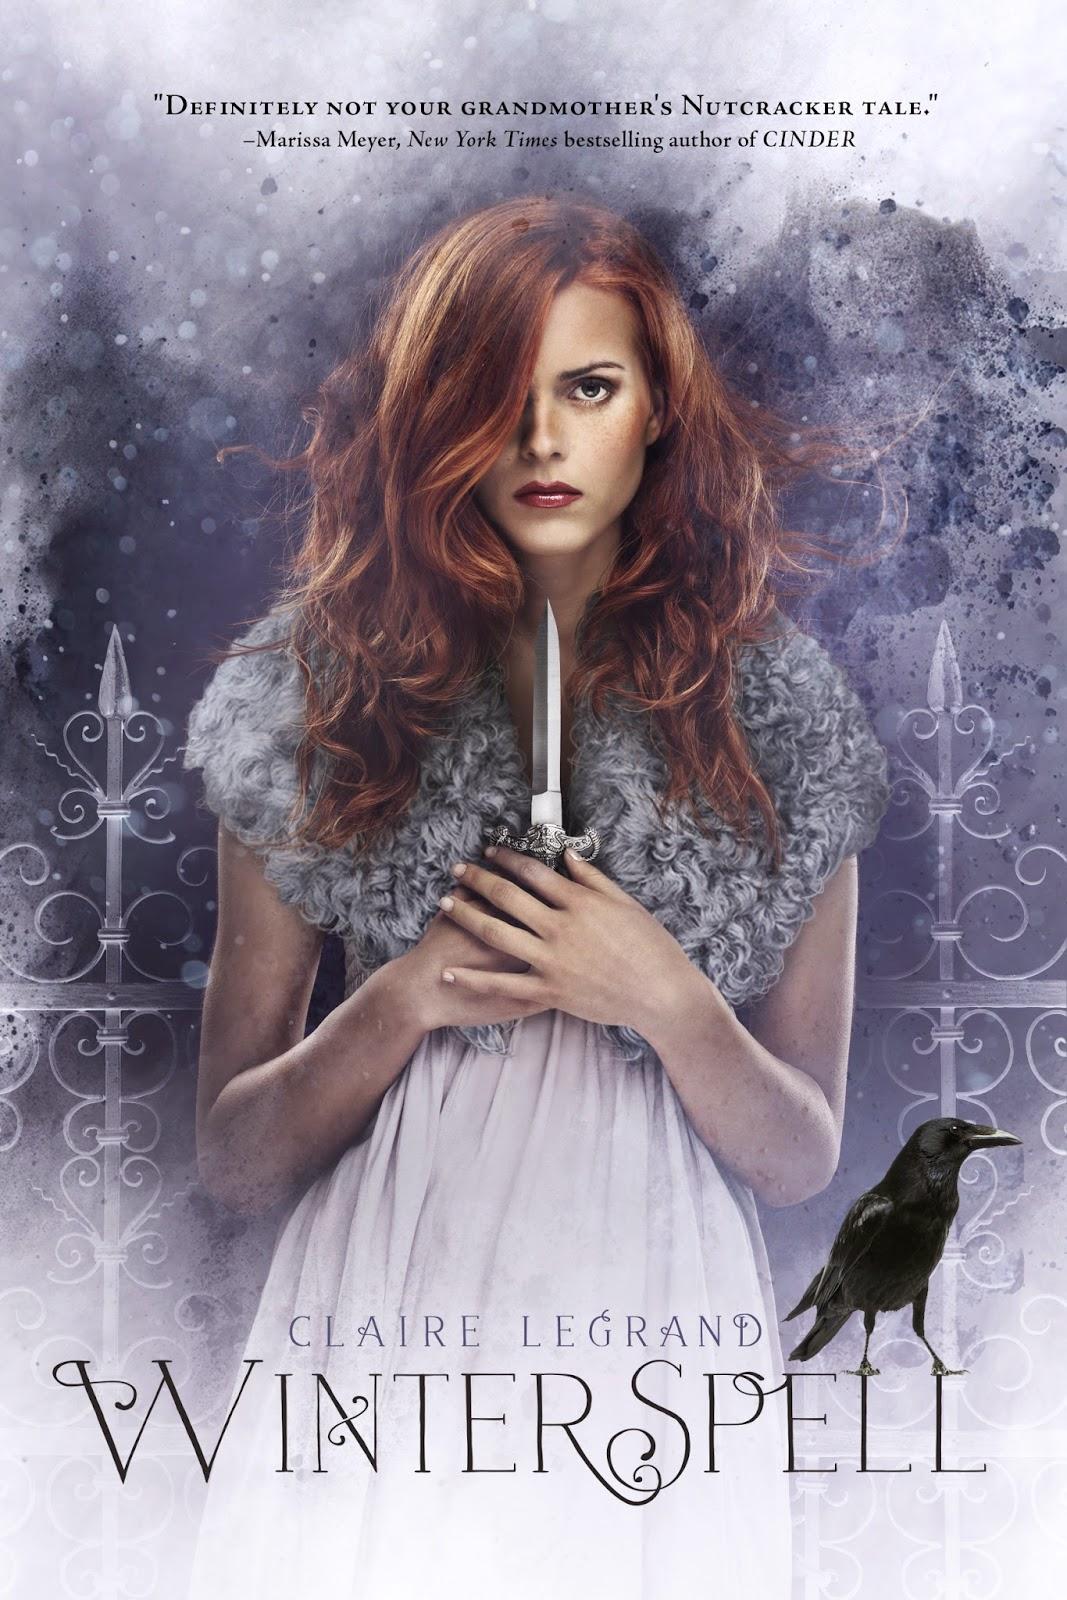 http://books.simonandschuster.com/Winterspell/Claire-Legrand/9781442465985